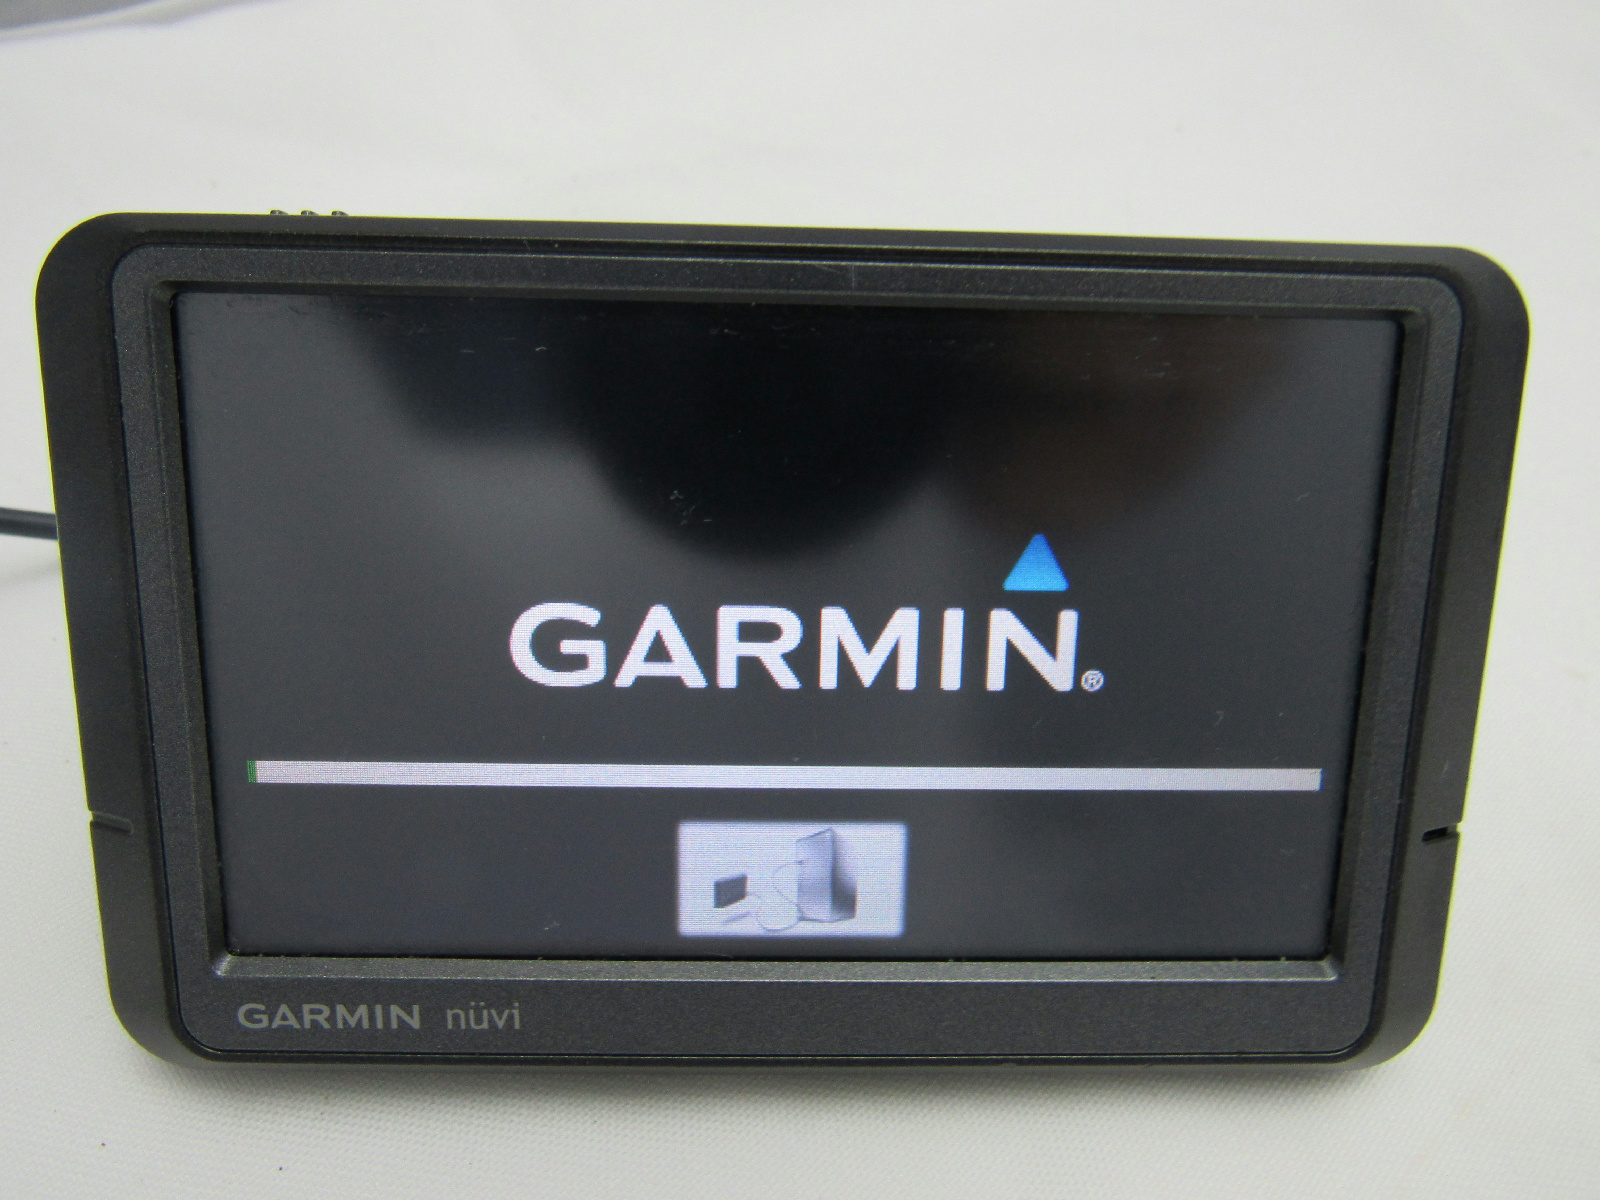 garmin nuvi 265w automotive gps unit ebay. Black Bedroom Furniture Sets. Home Design Ideas